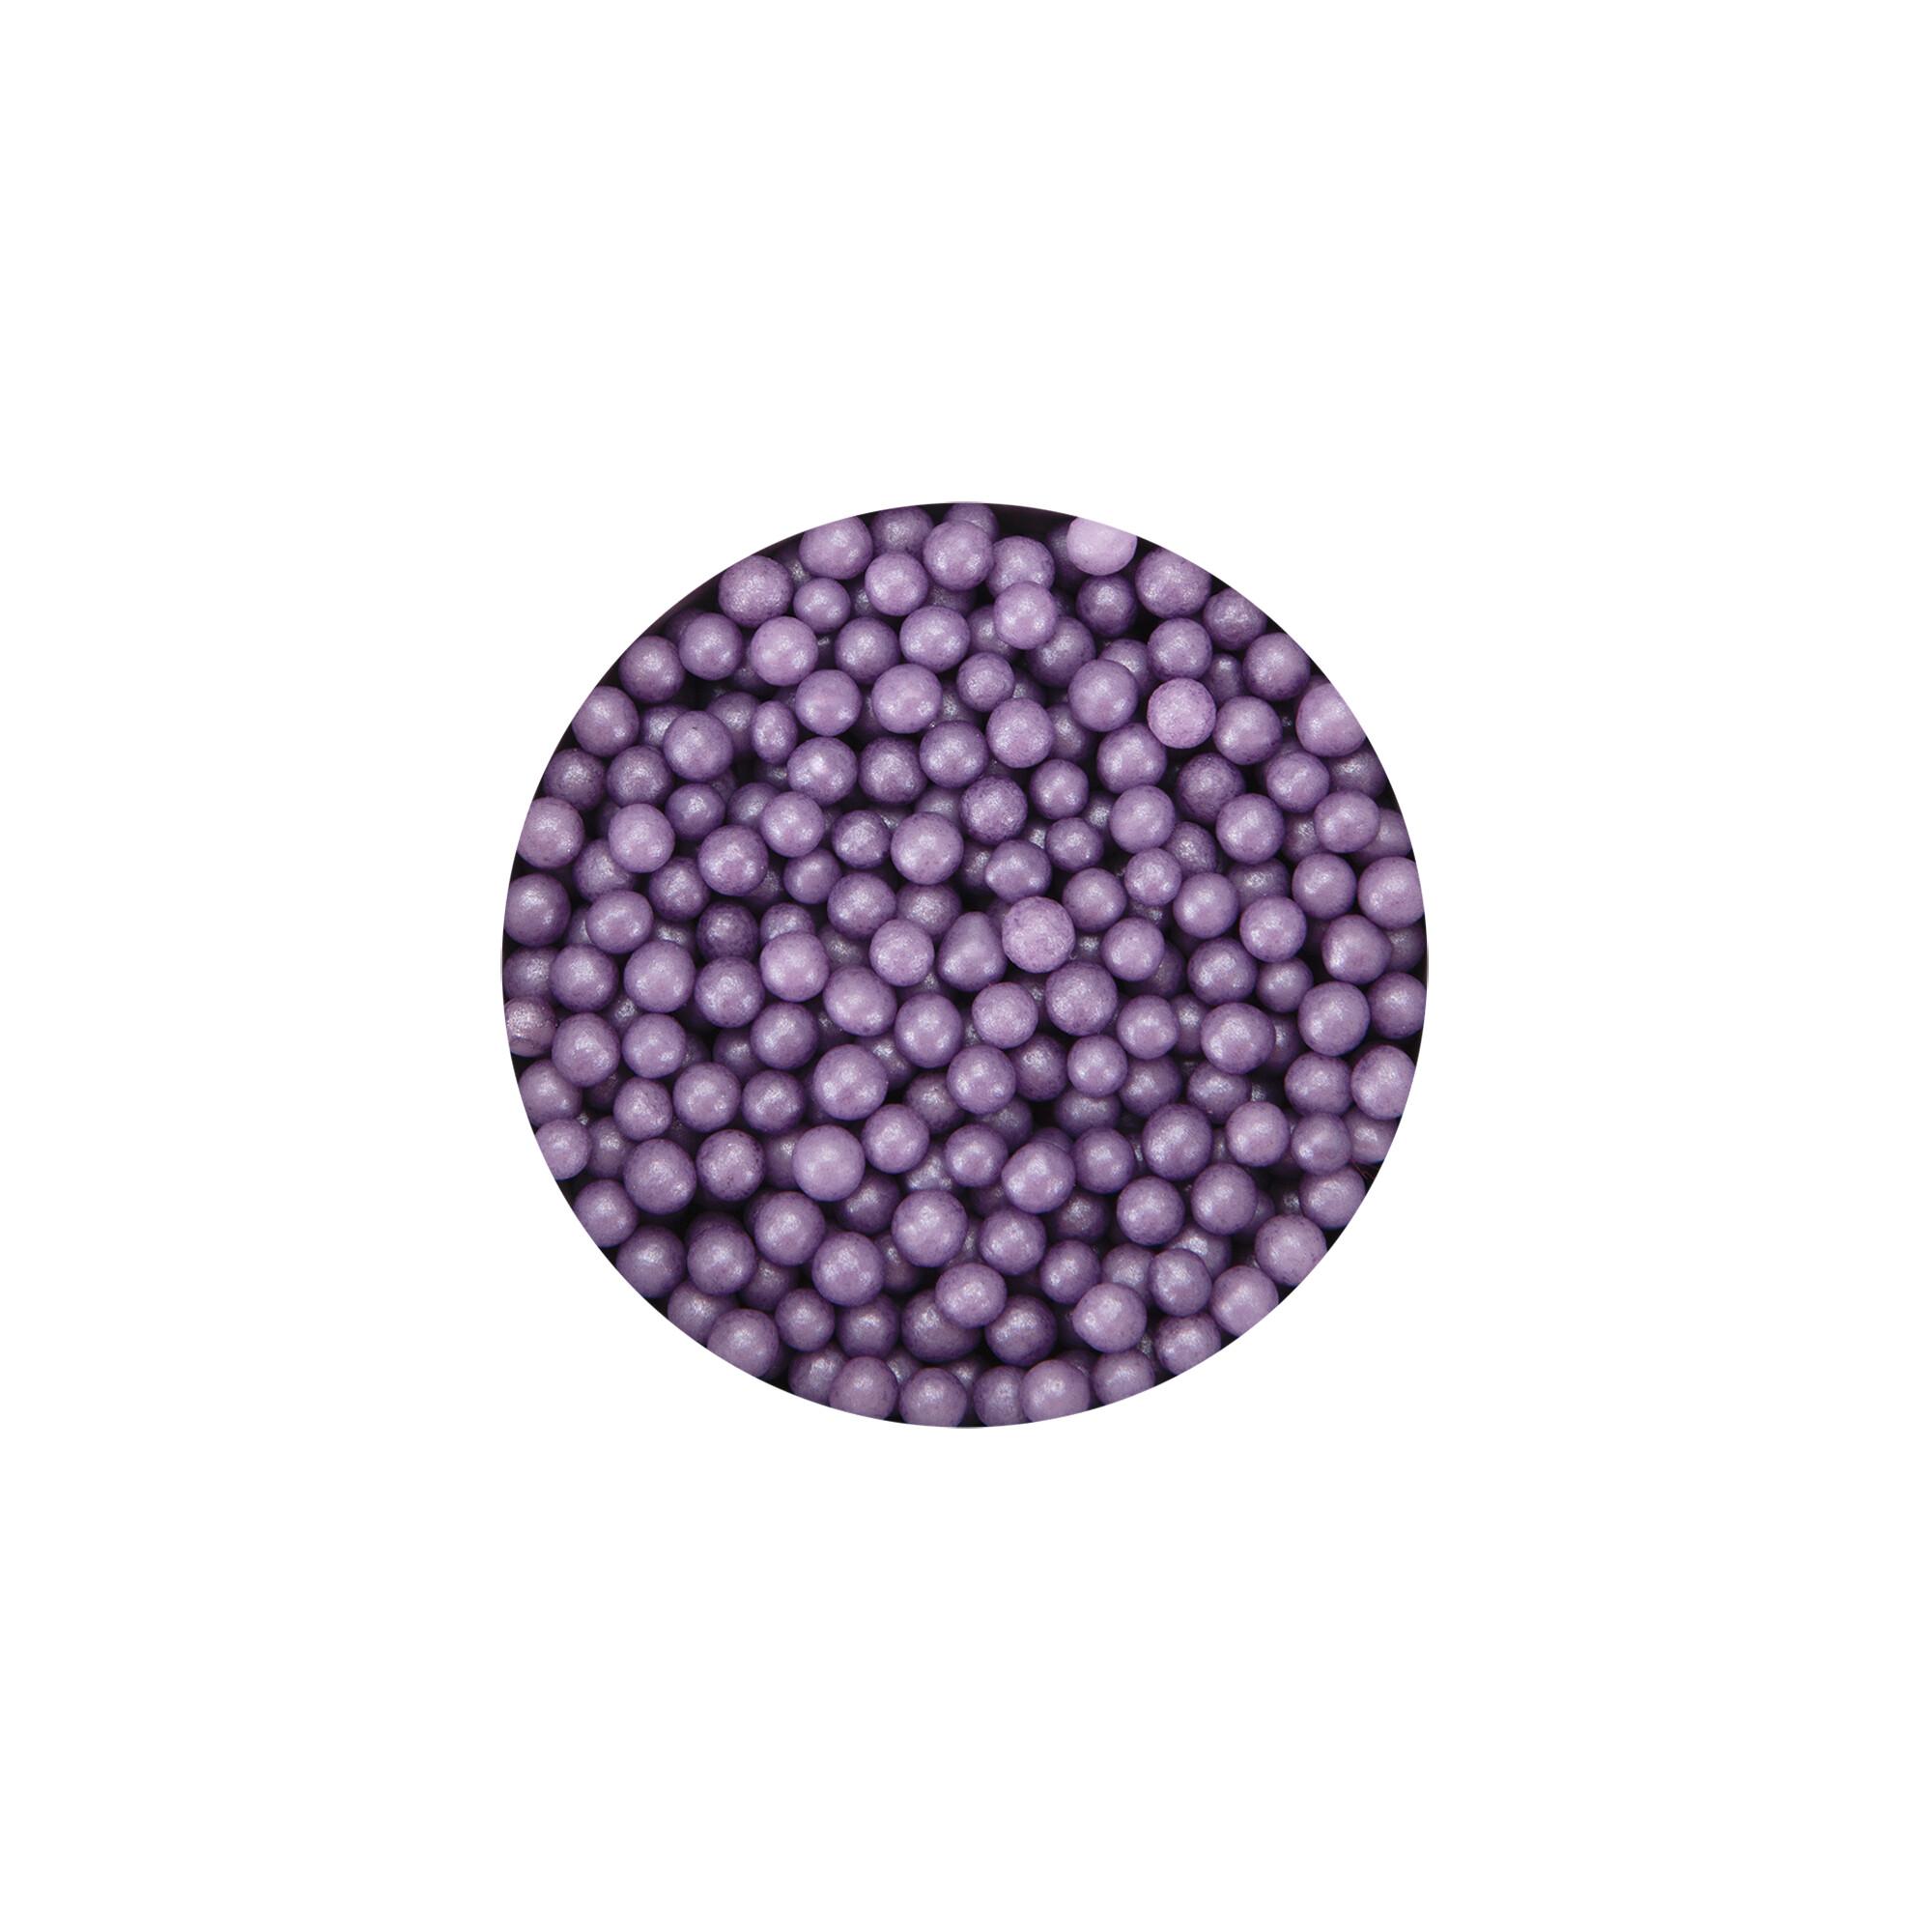 Edible sprinkle decoration - Pearls Mini